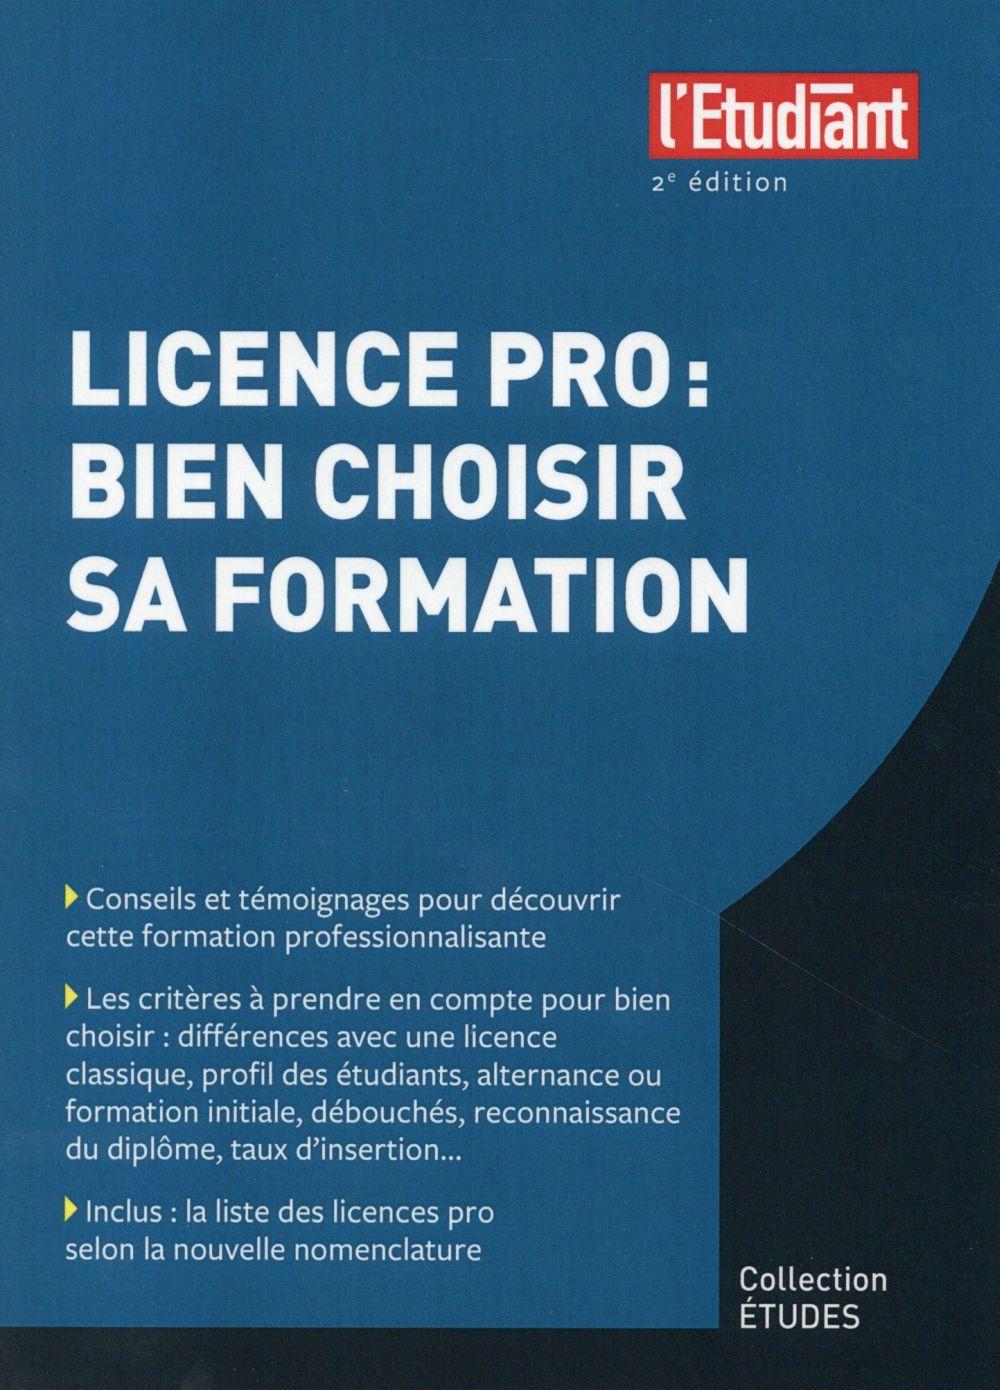 licence pro ; bien choisir sa formation (2e édition)